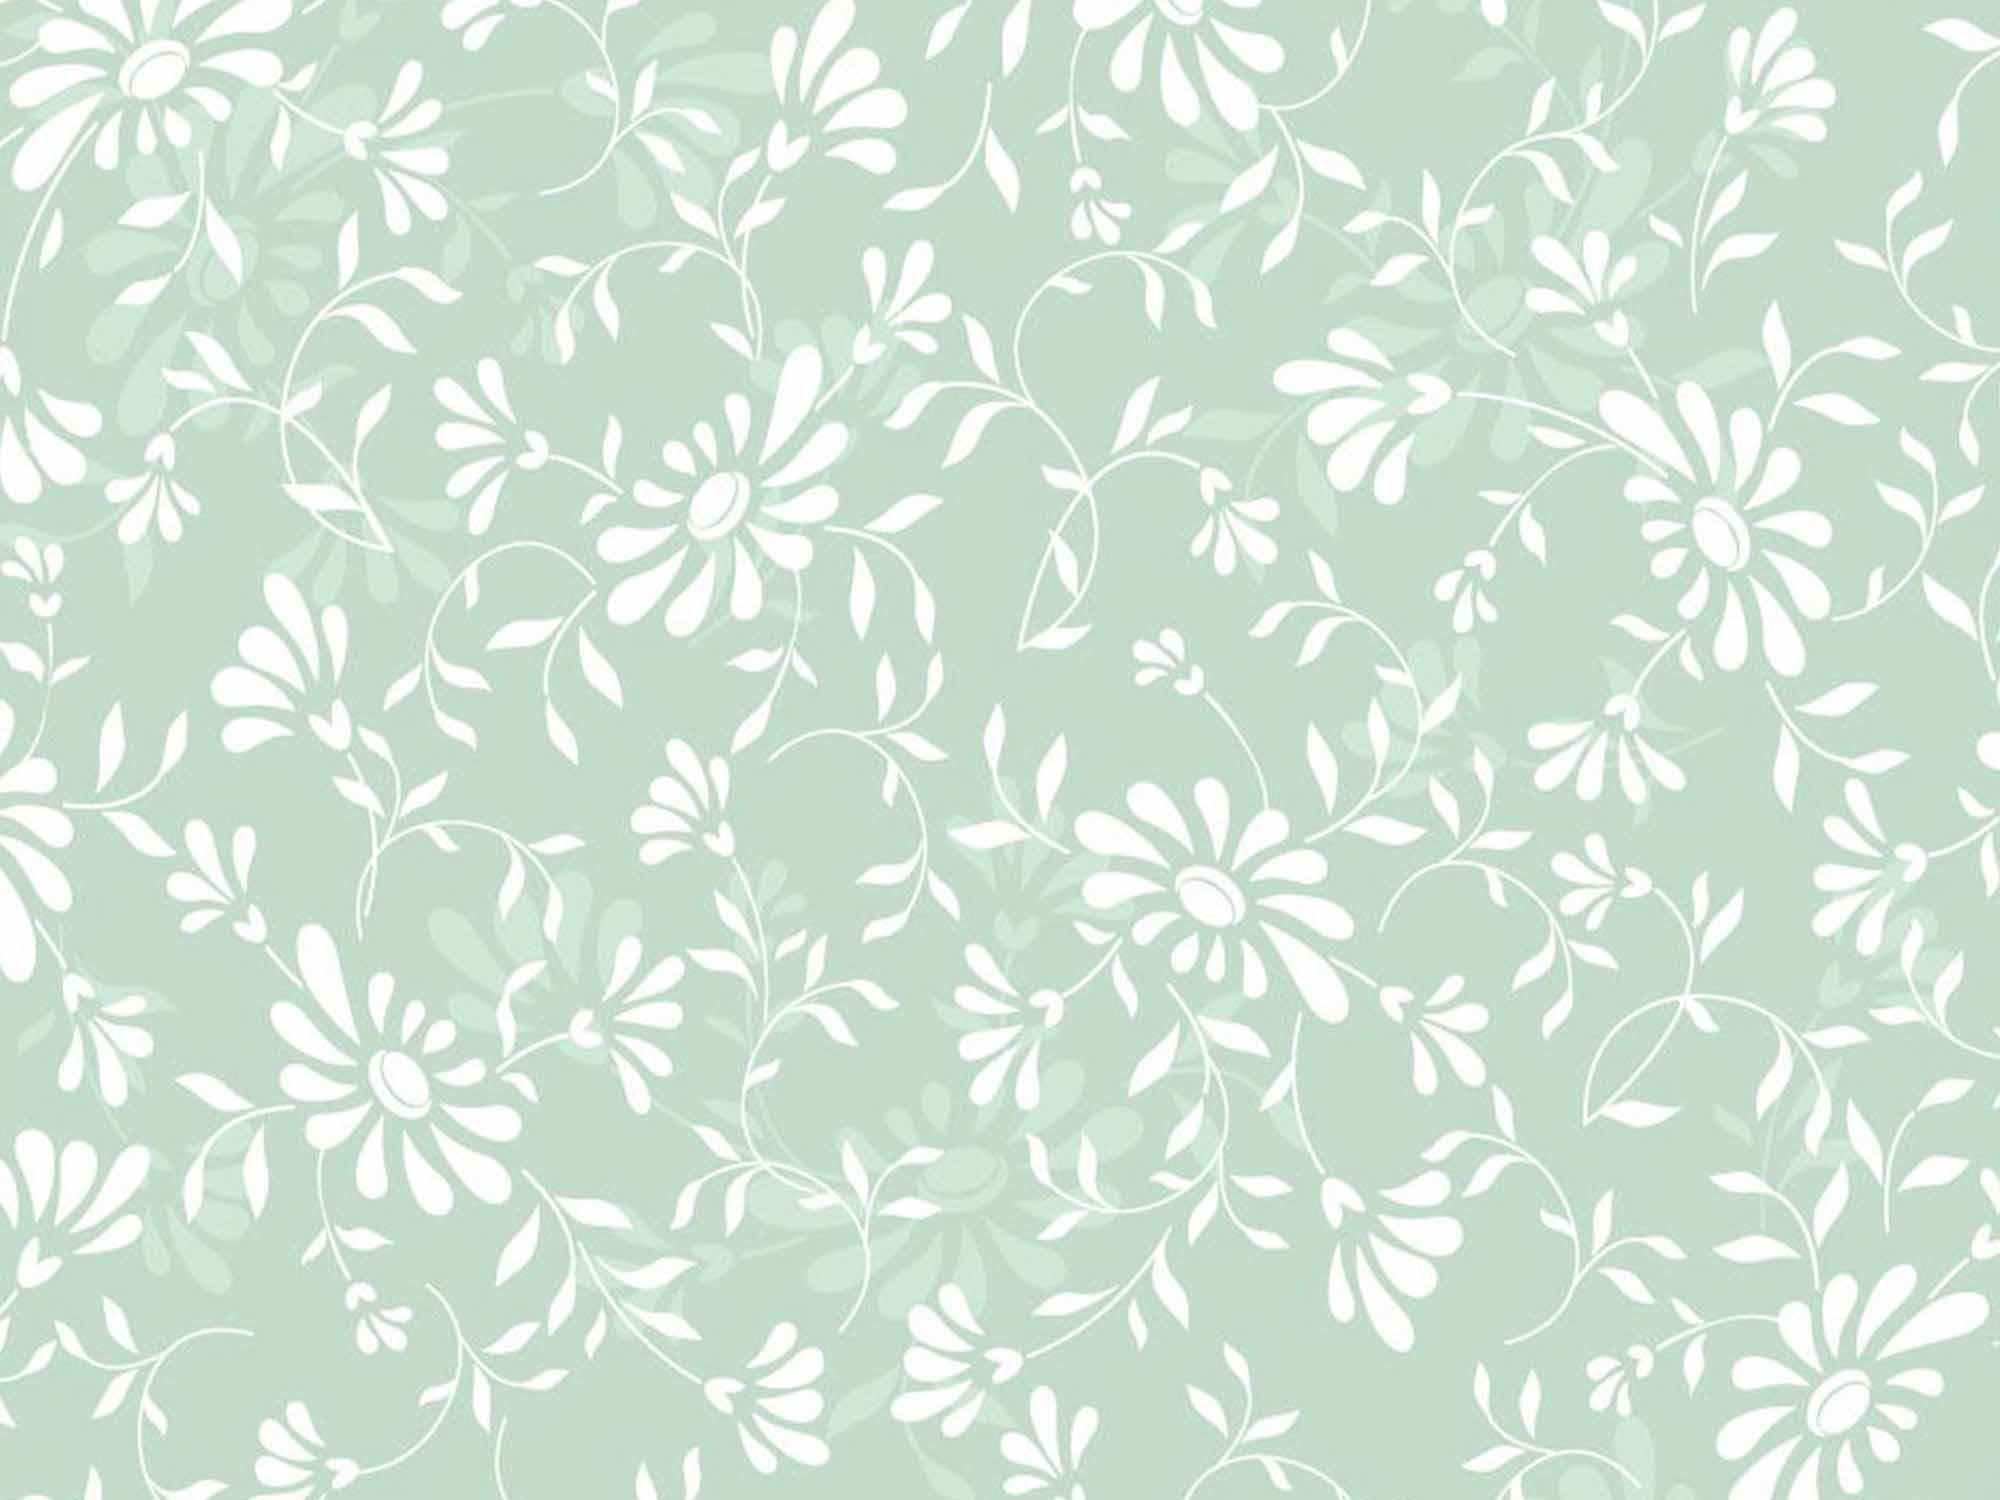 Papel de Parede Floral 0040 - Adesivos de Parede  - Paredes Decoradas